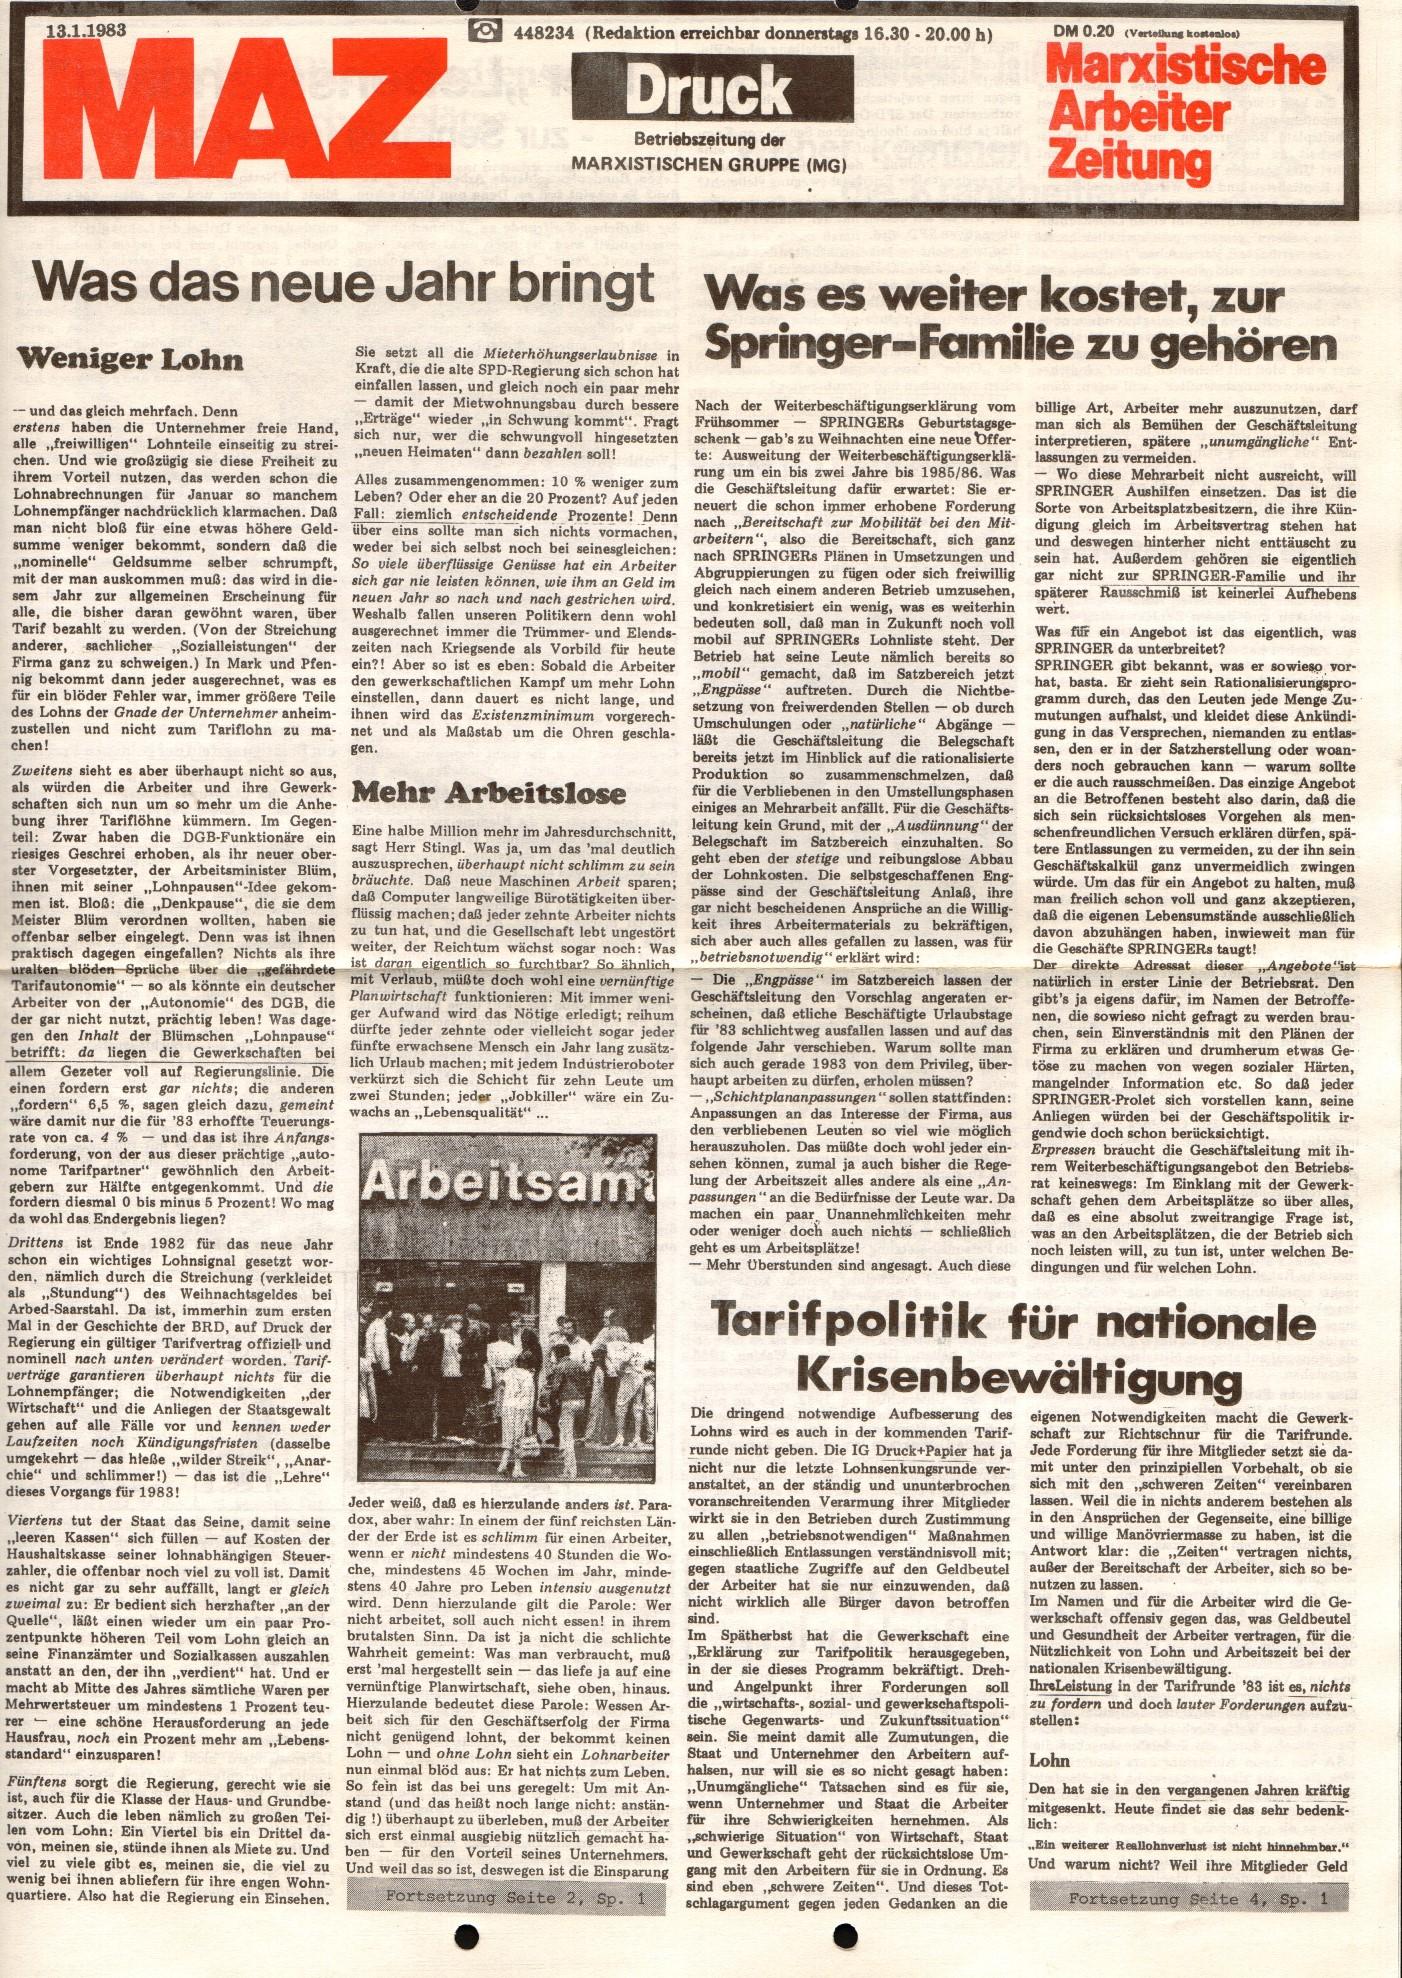 Hamburg_MG_MAZ_Druck_19830113_01